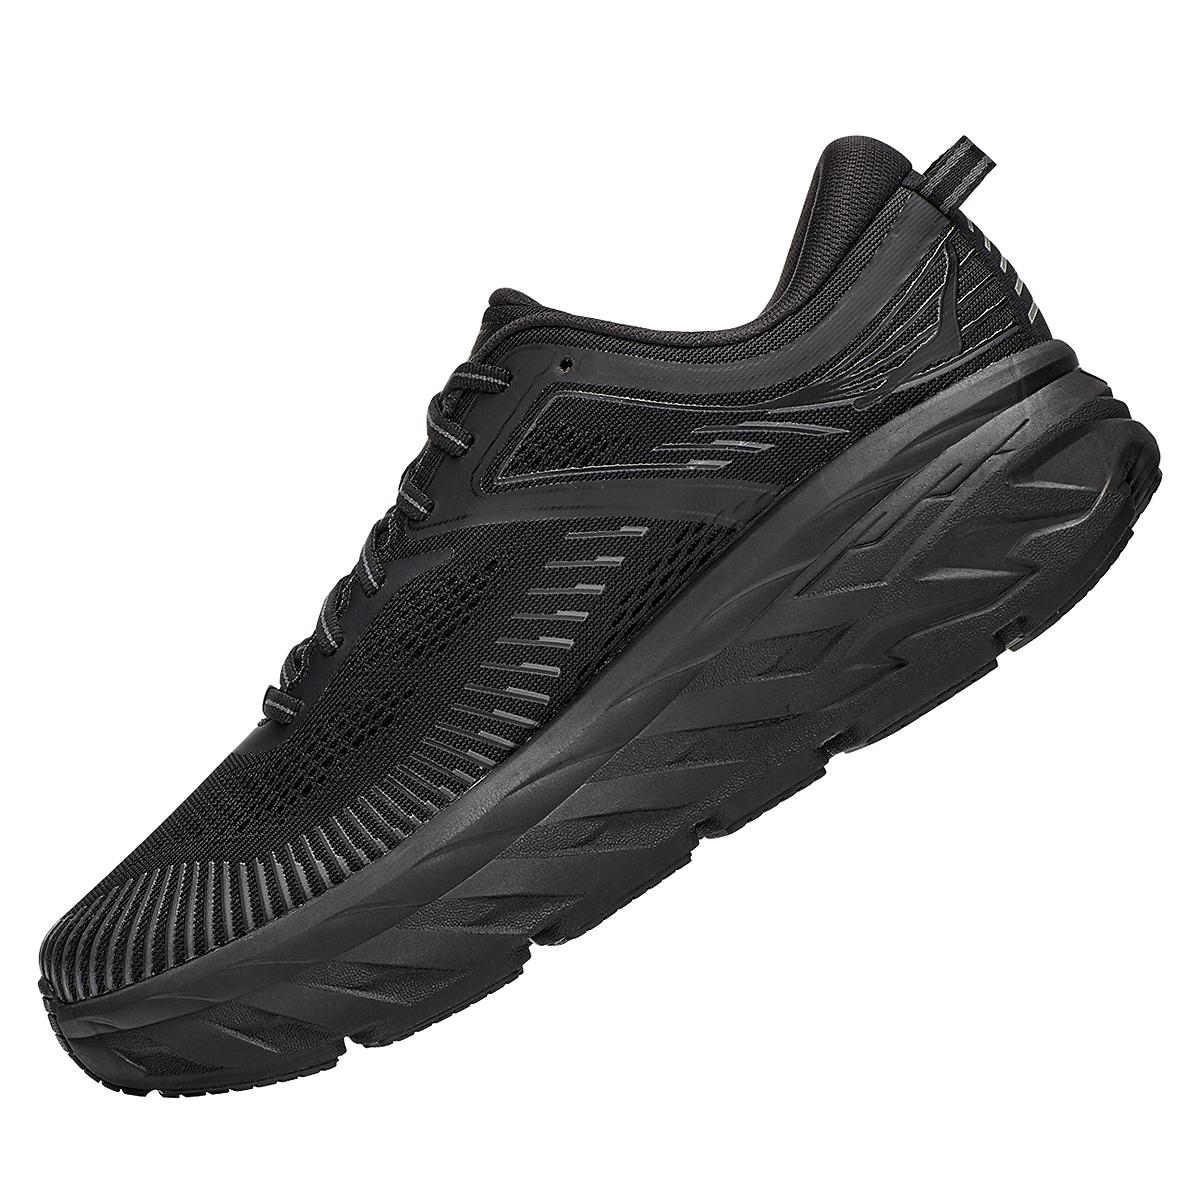 Men's Hoka One One Bondi 7 Running Shoe - Color: Black - Size: 7.5 - Width: Regular, Black, large, image 4